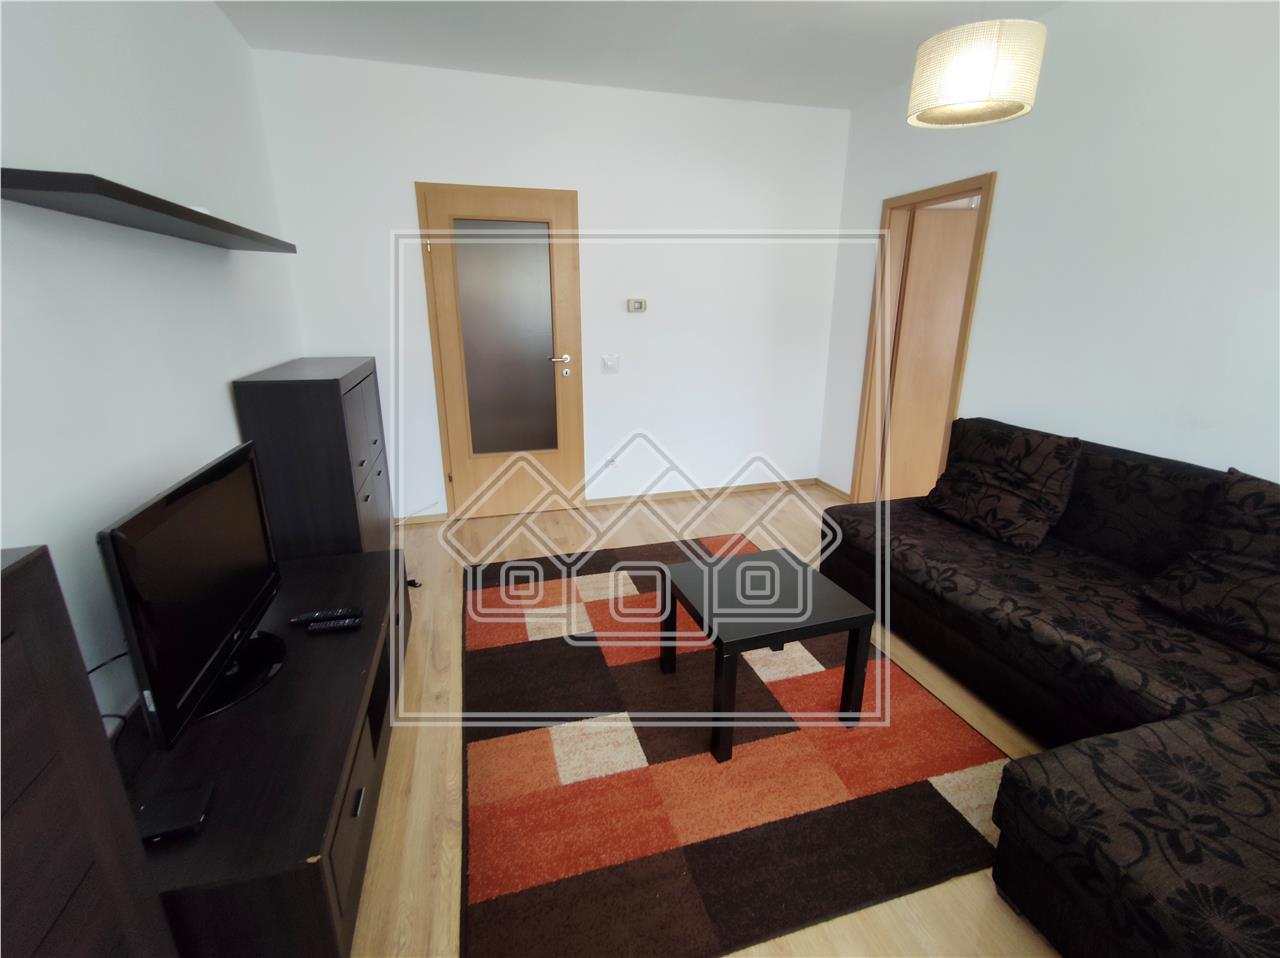 Apartament 3 camere de inchiriat in Sibiu - zona Rahovei - bloc recent